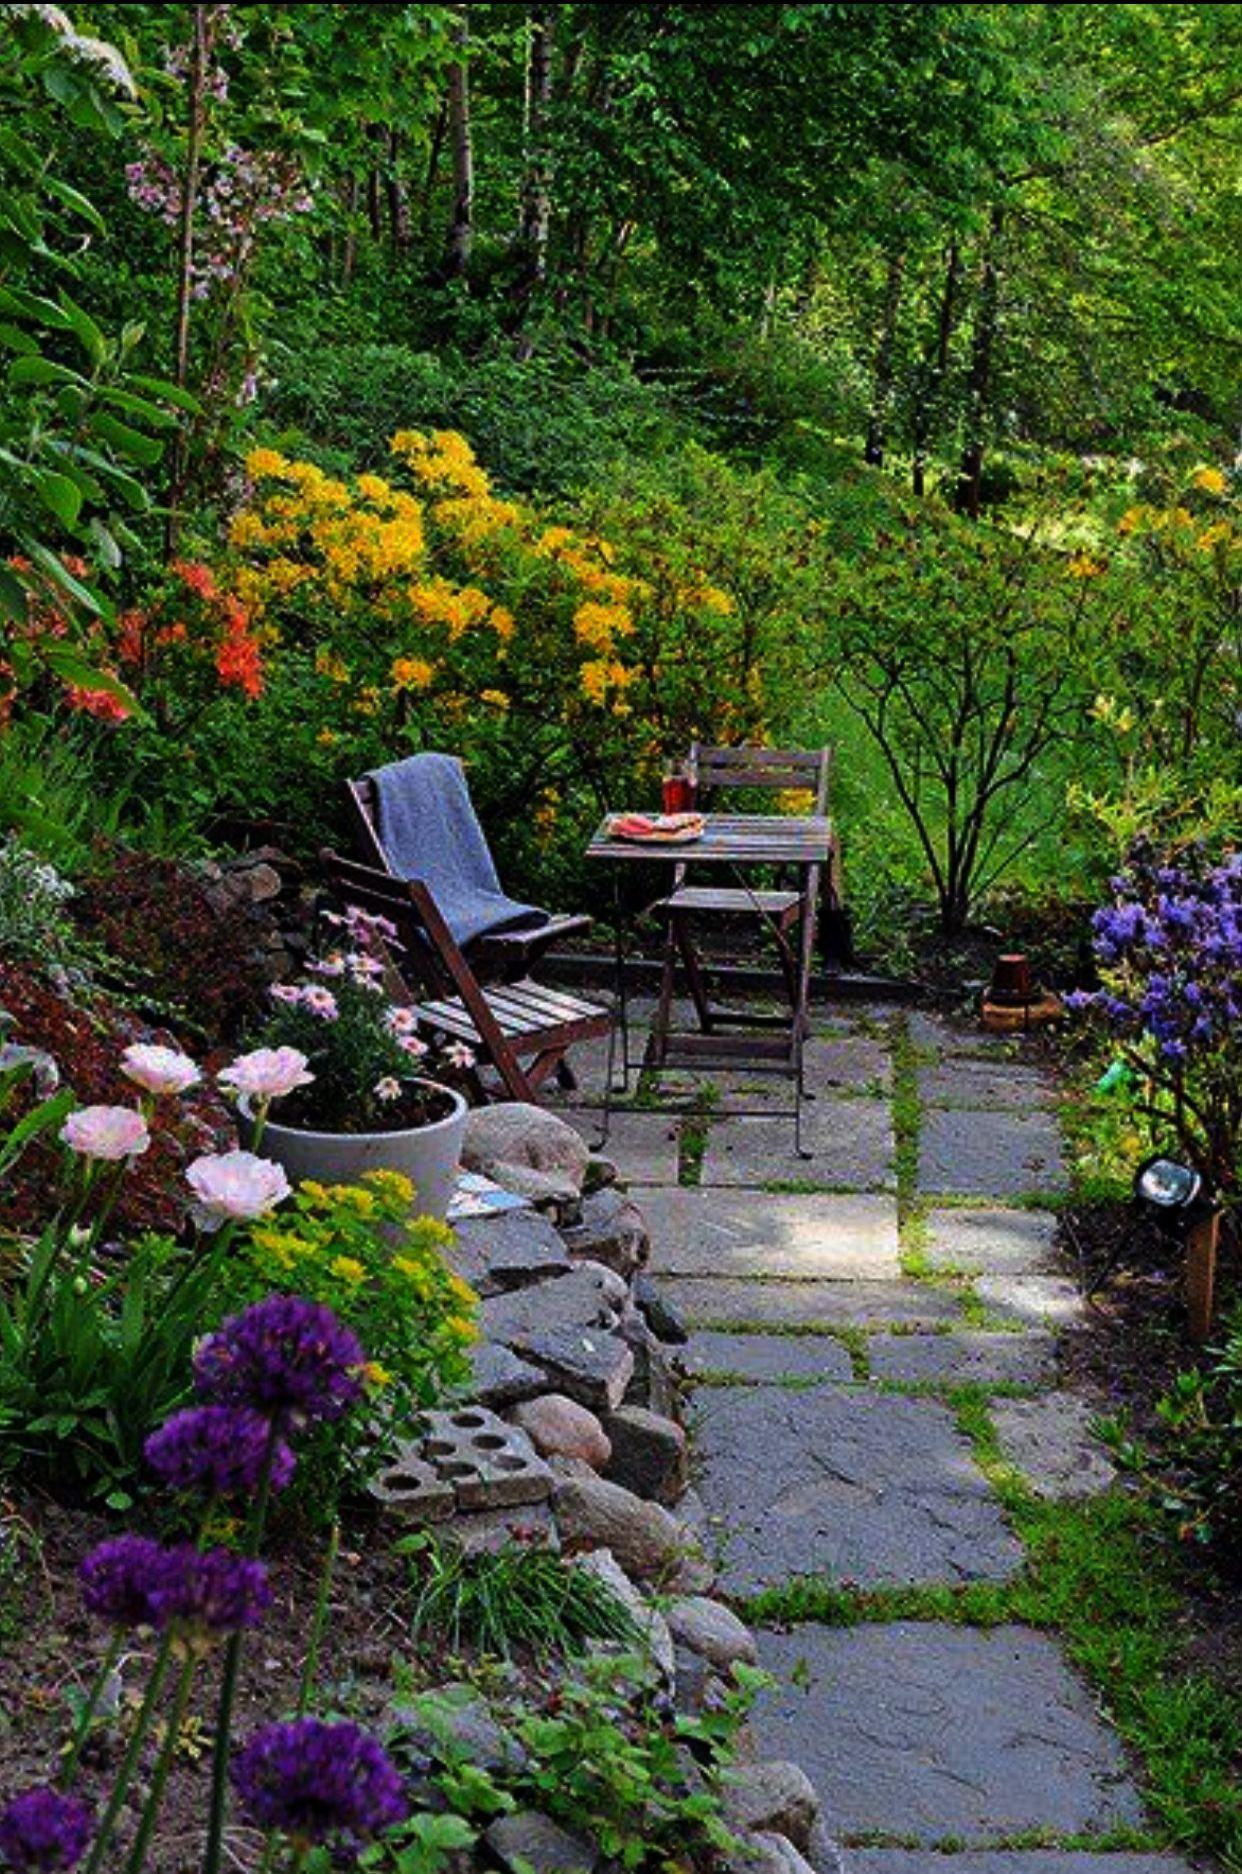 Garden Landscaping Delhi Garden Landscaping Falkirk Without Garden Landscape Design App Long Garden Lan Garden Sitting Areas Outdoor Gardens Luxury Flowers